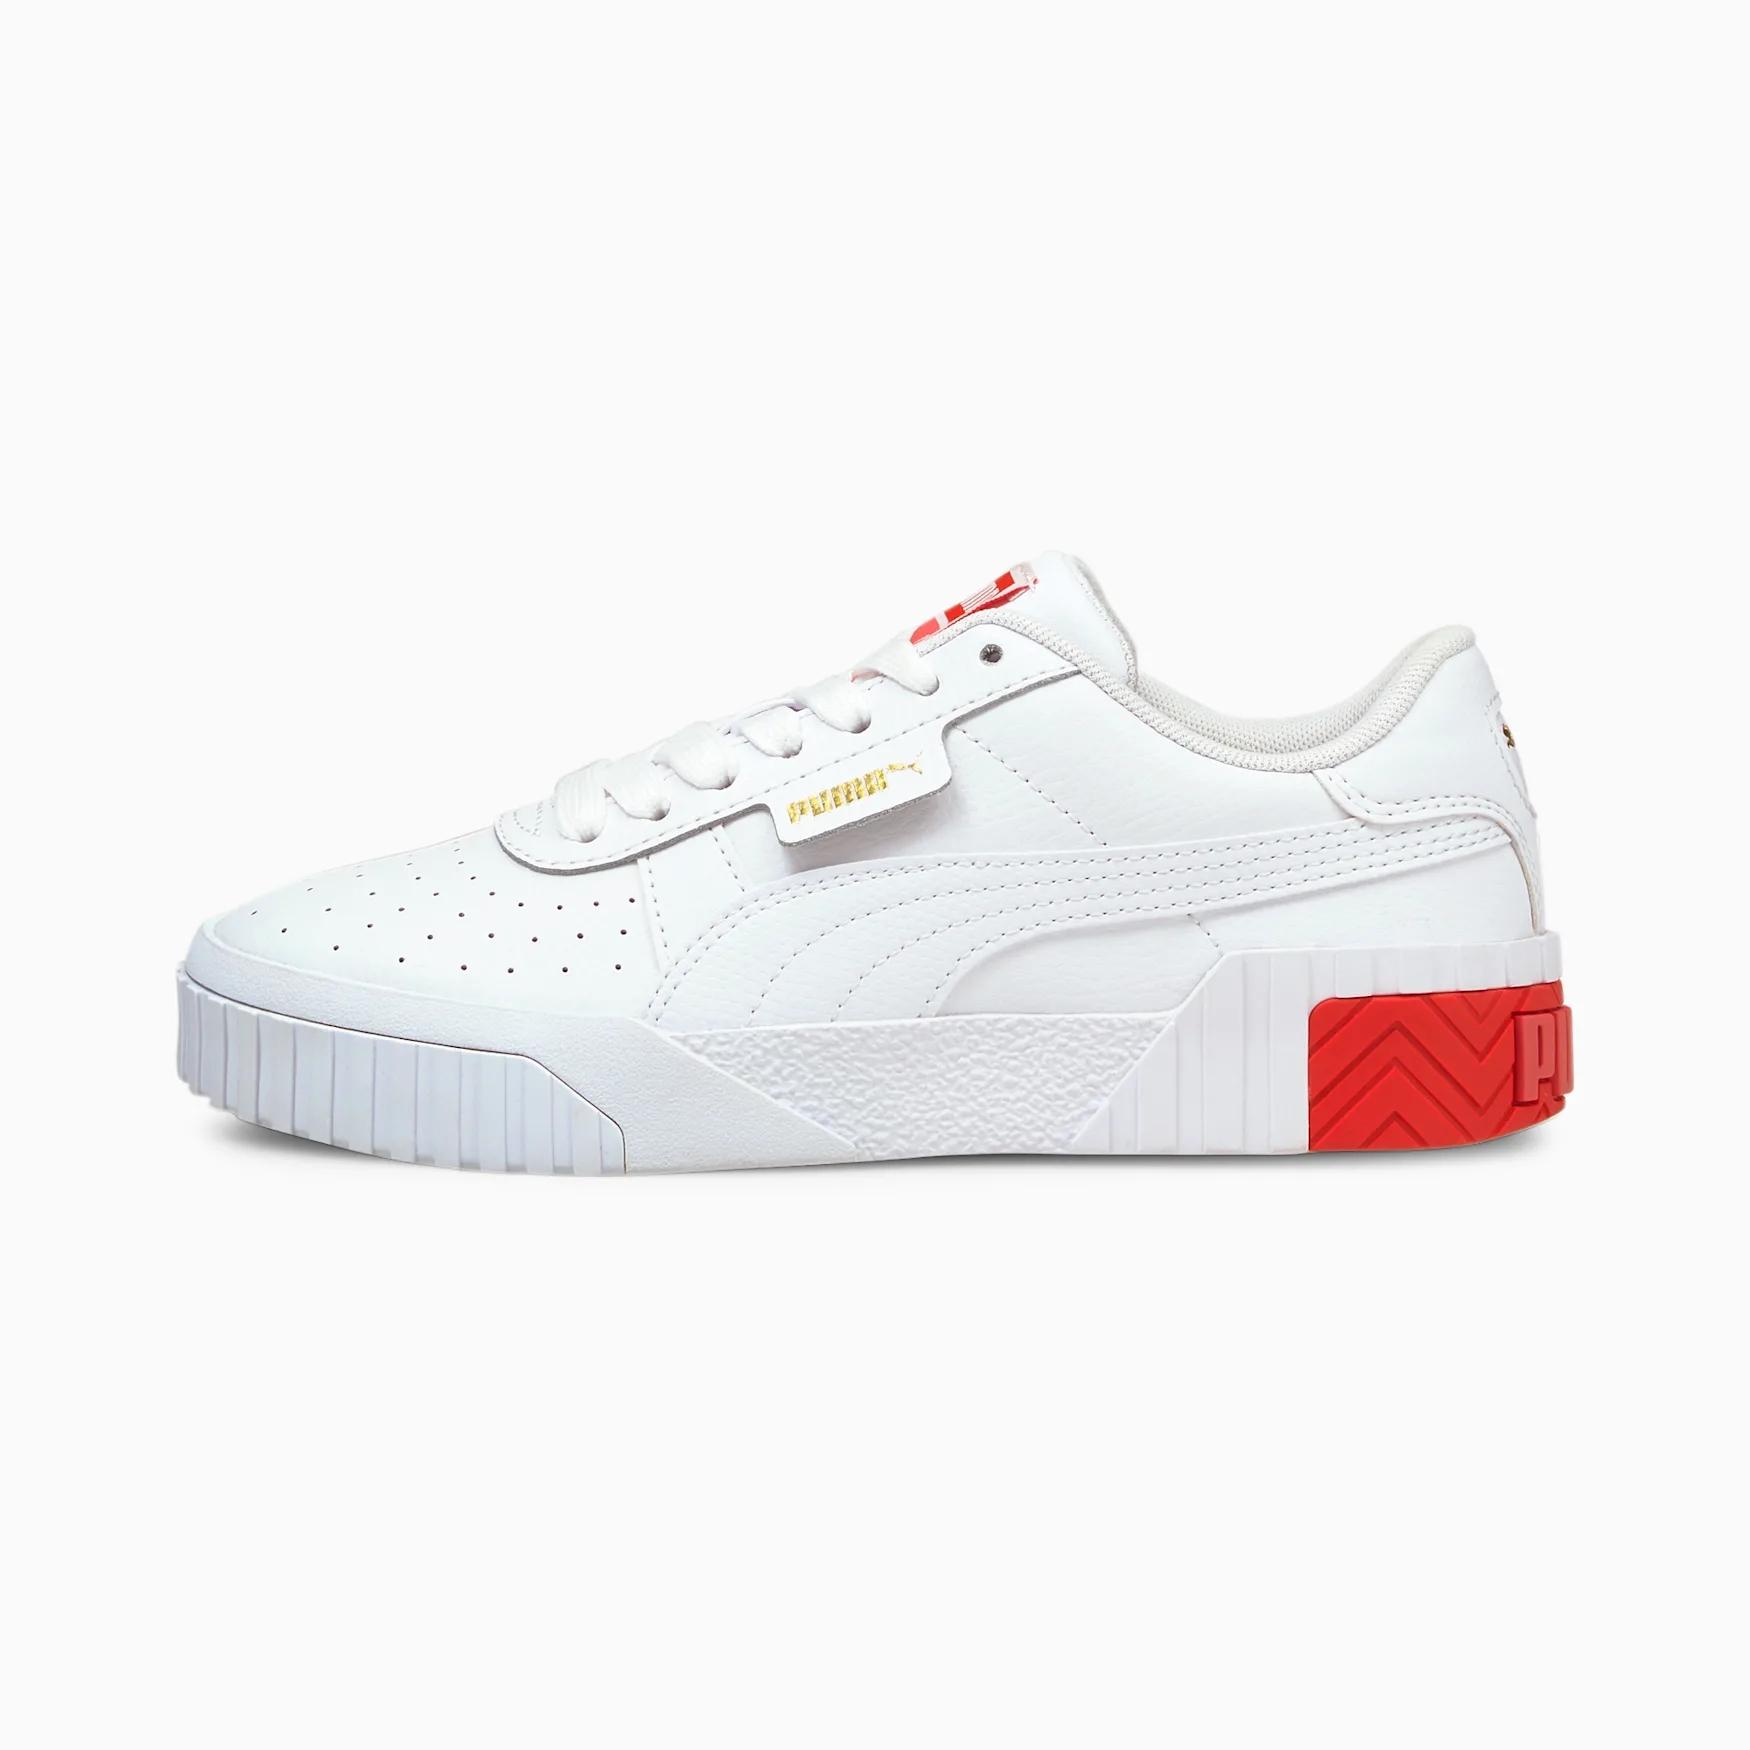 Puma US官網:鞋服年中大促 低至6折+滿額免郵 ¥224收經典Clyde Snake女士運動鞋!